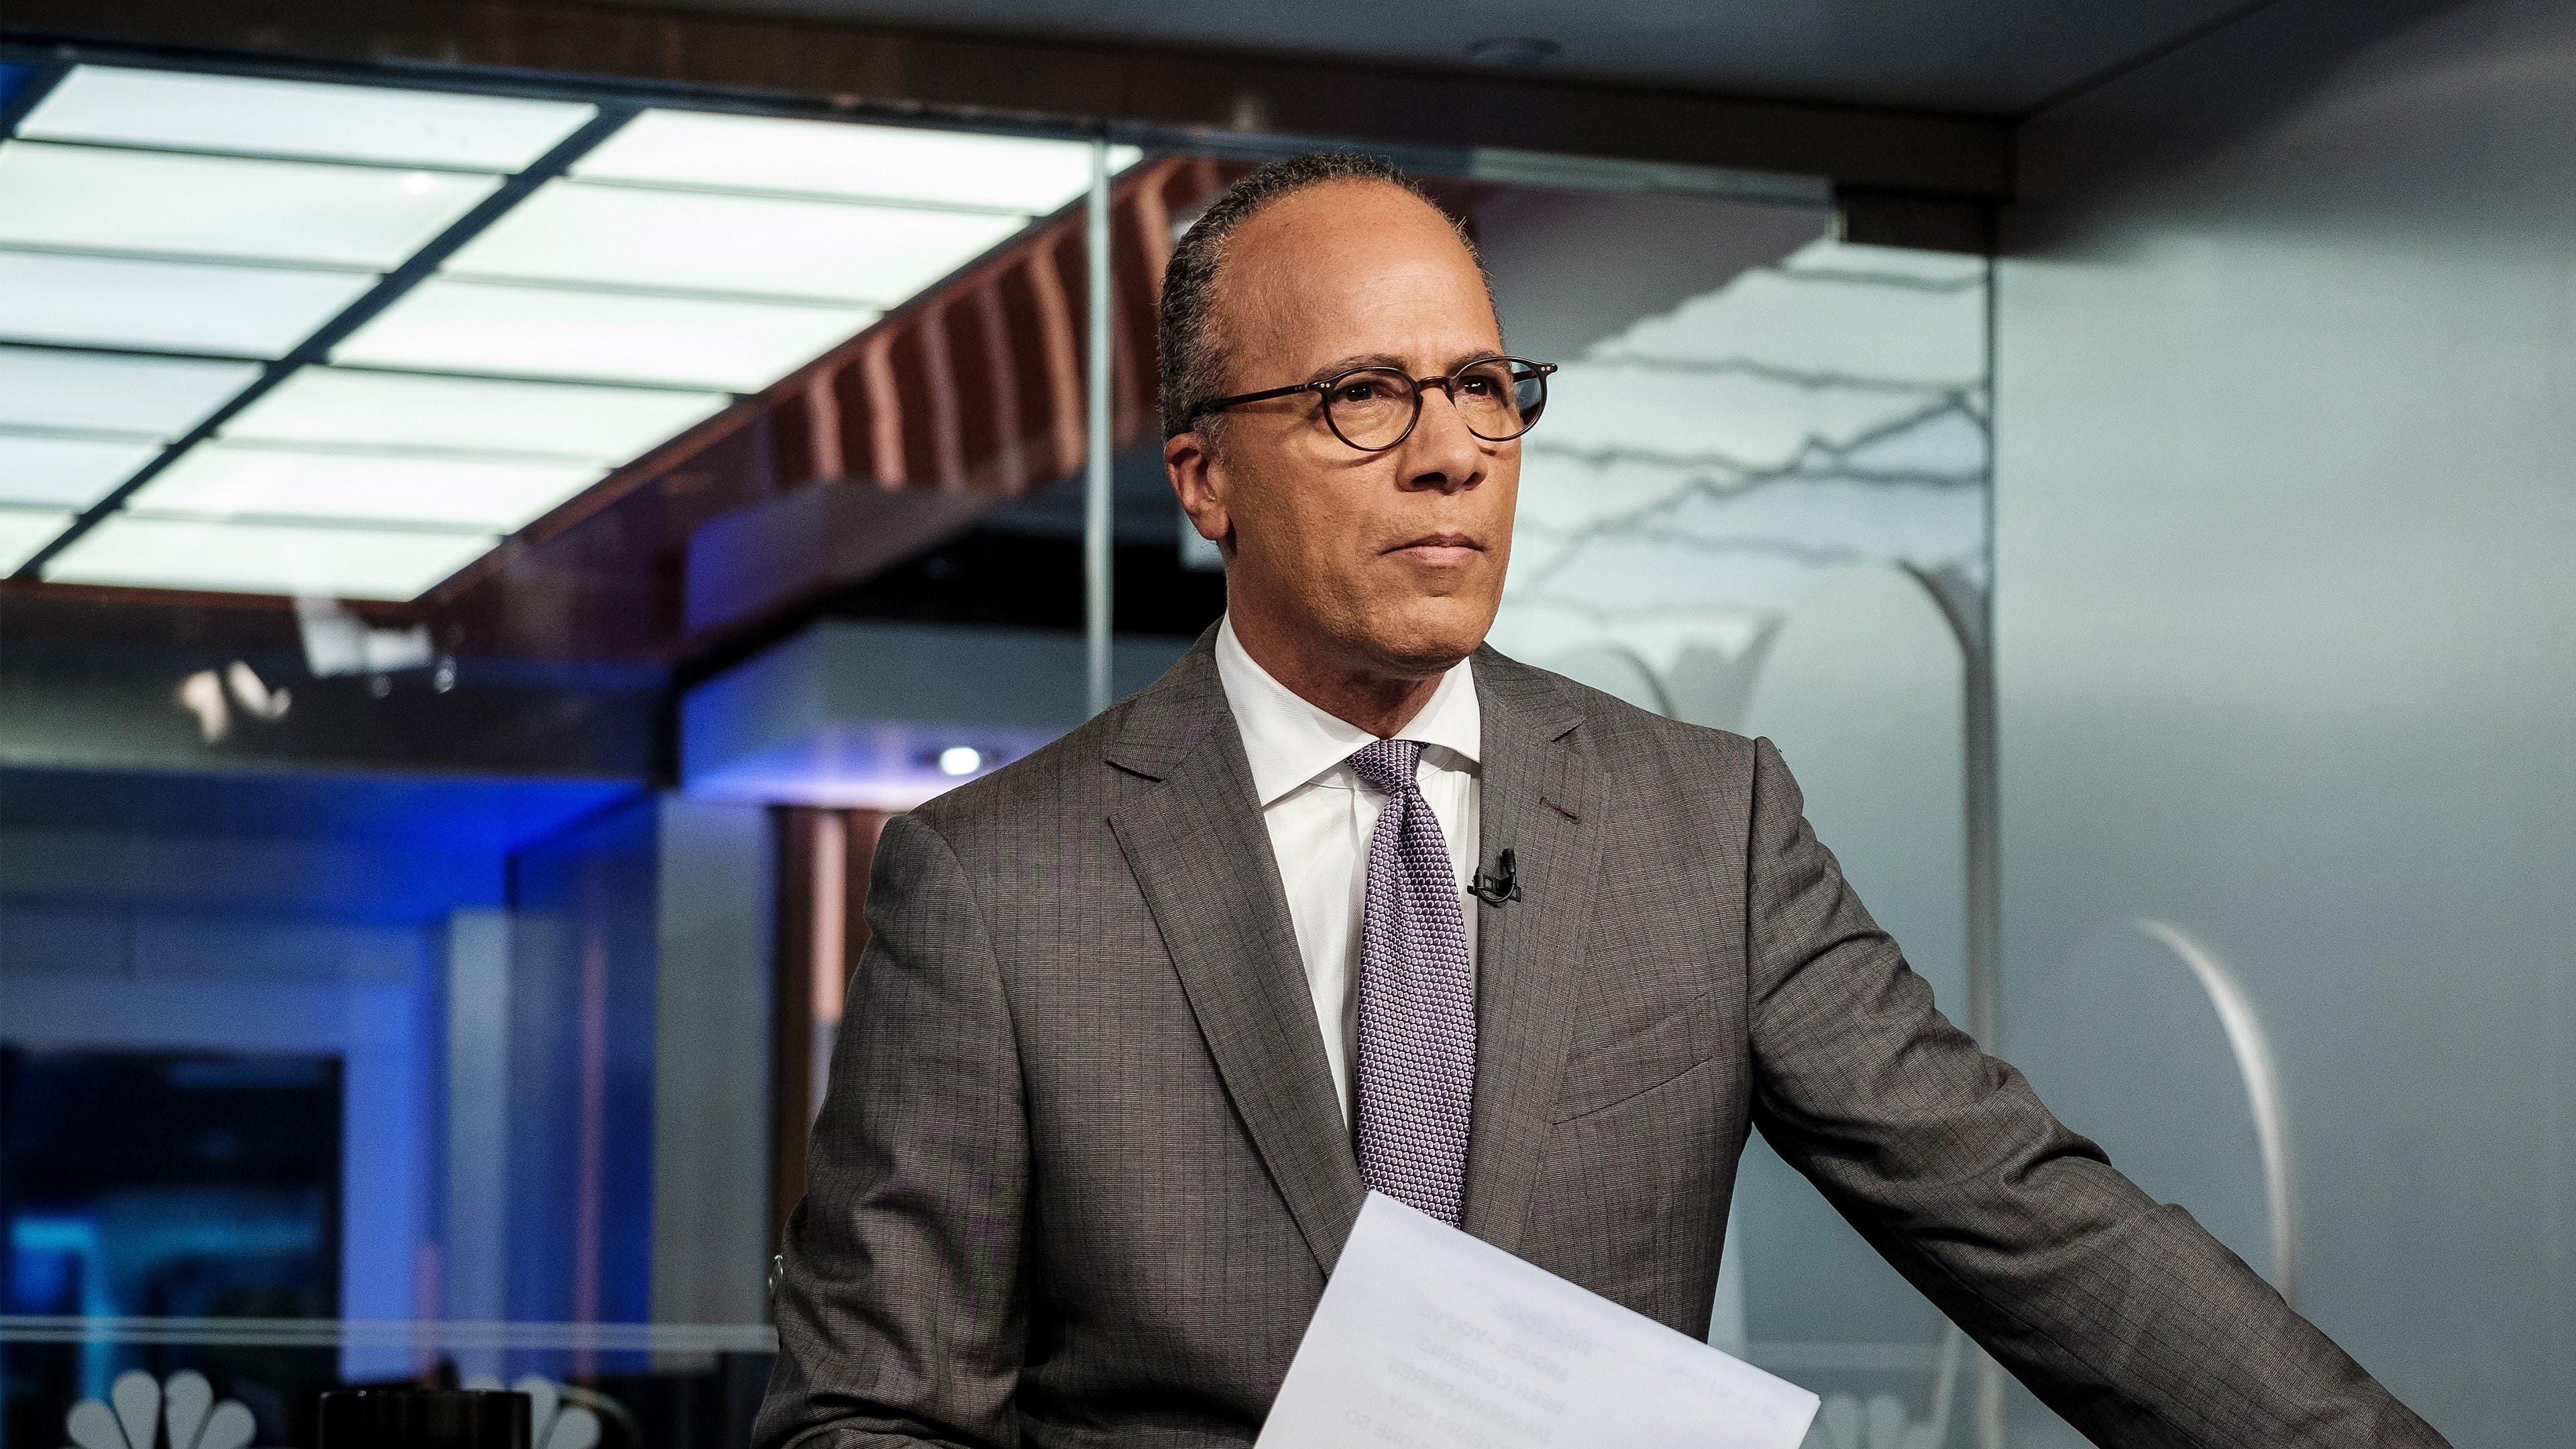 NBC News Special: America in Crisis